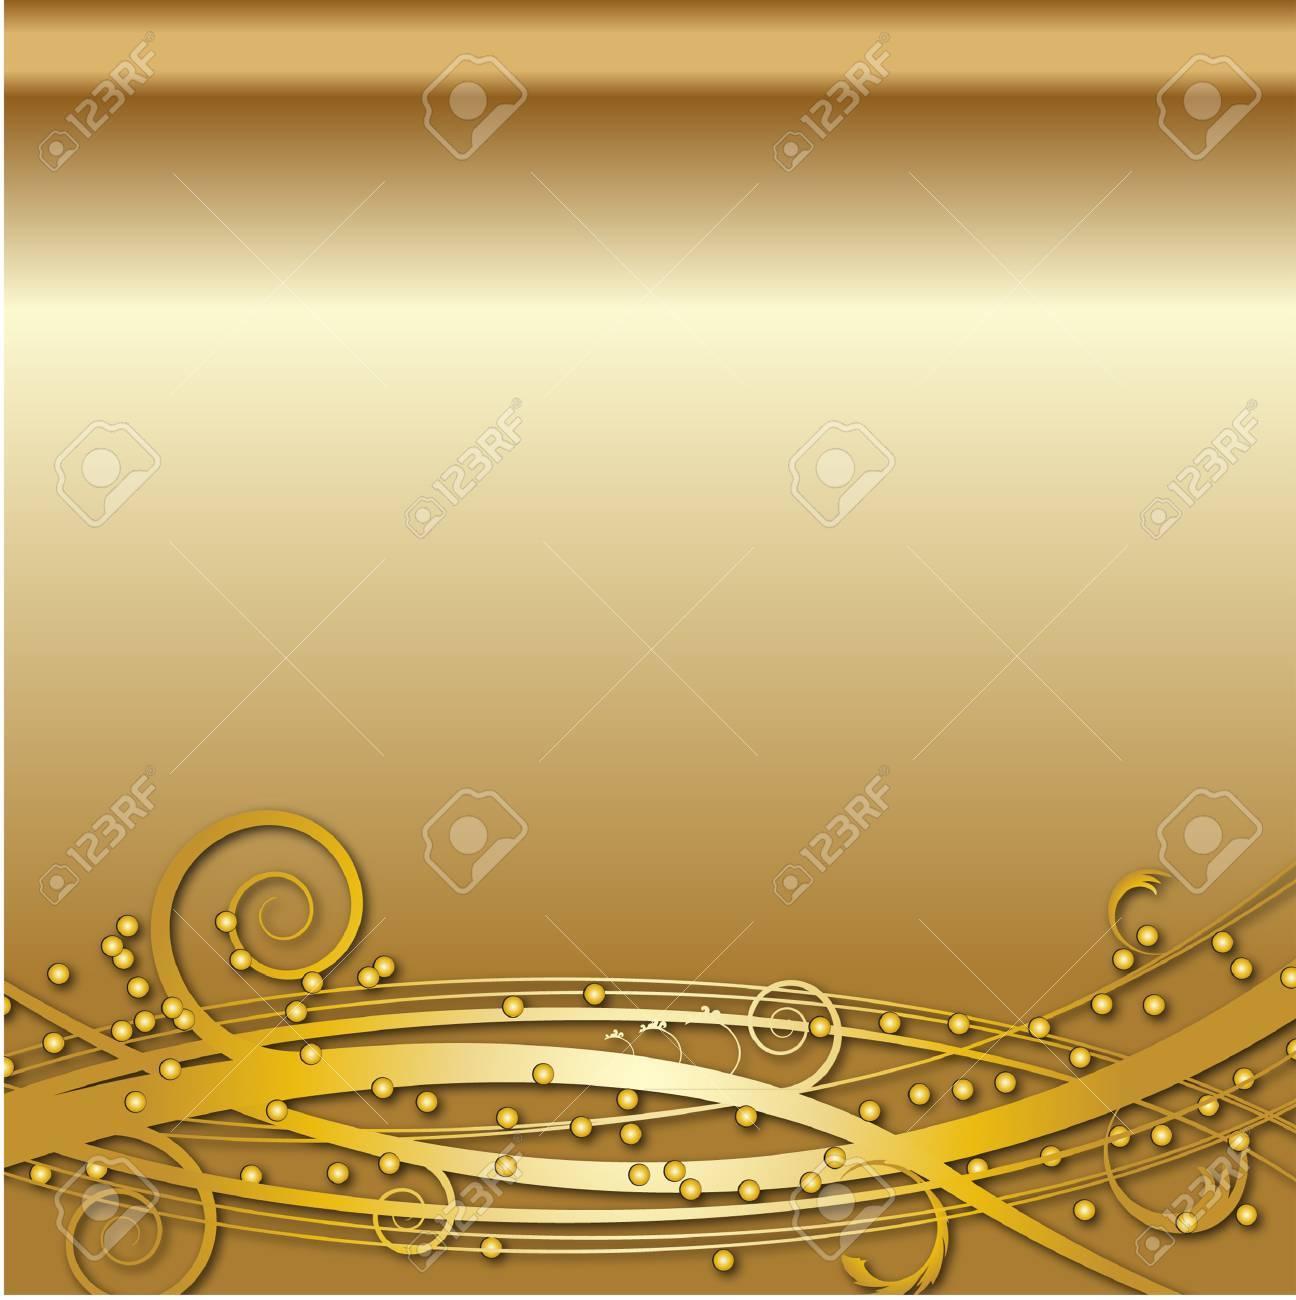 GOLD SWIRL BACKGROUND - 35862179